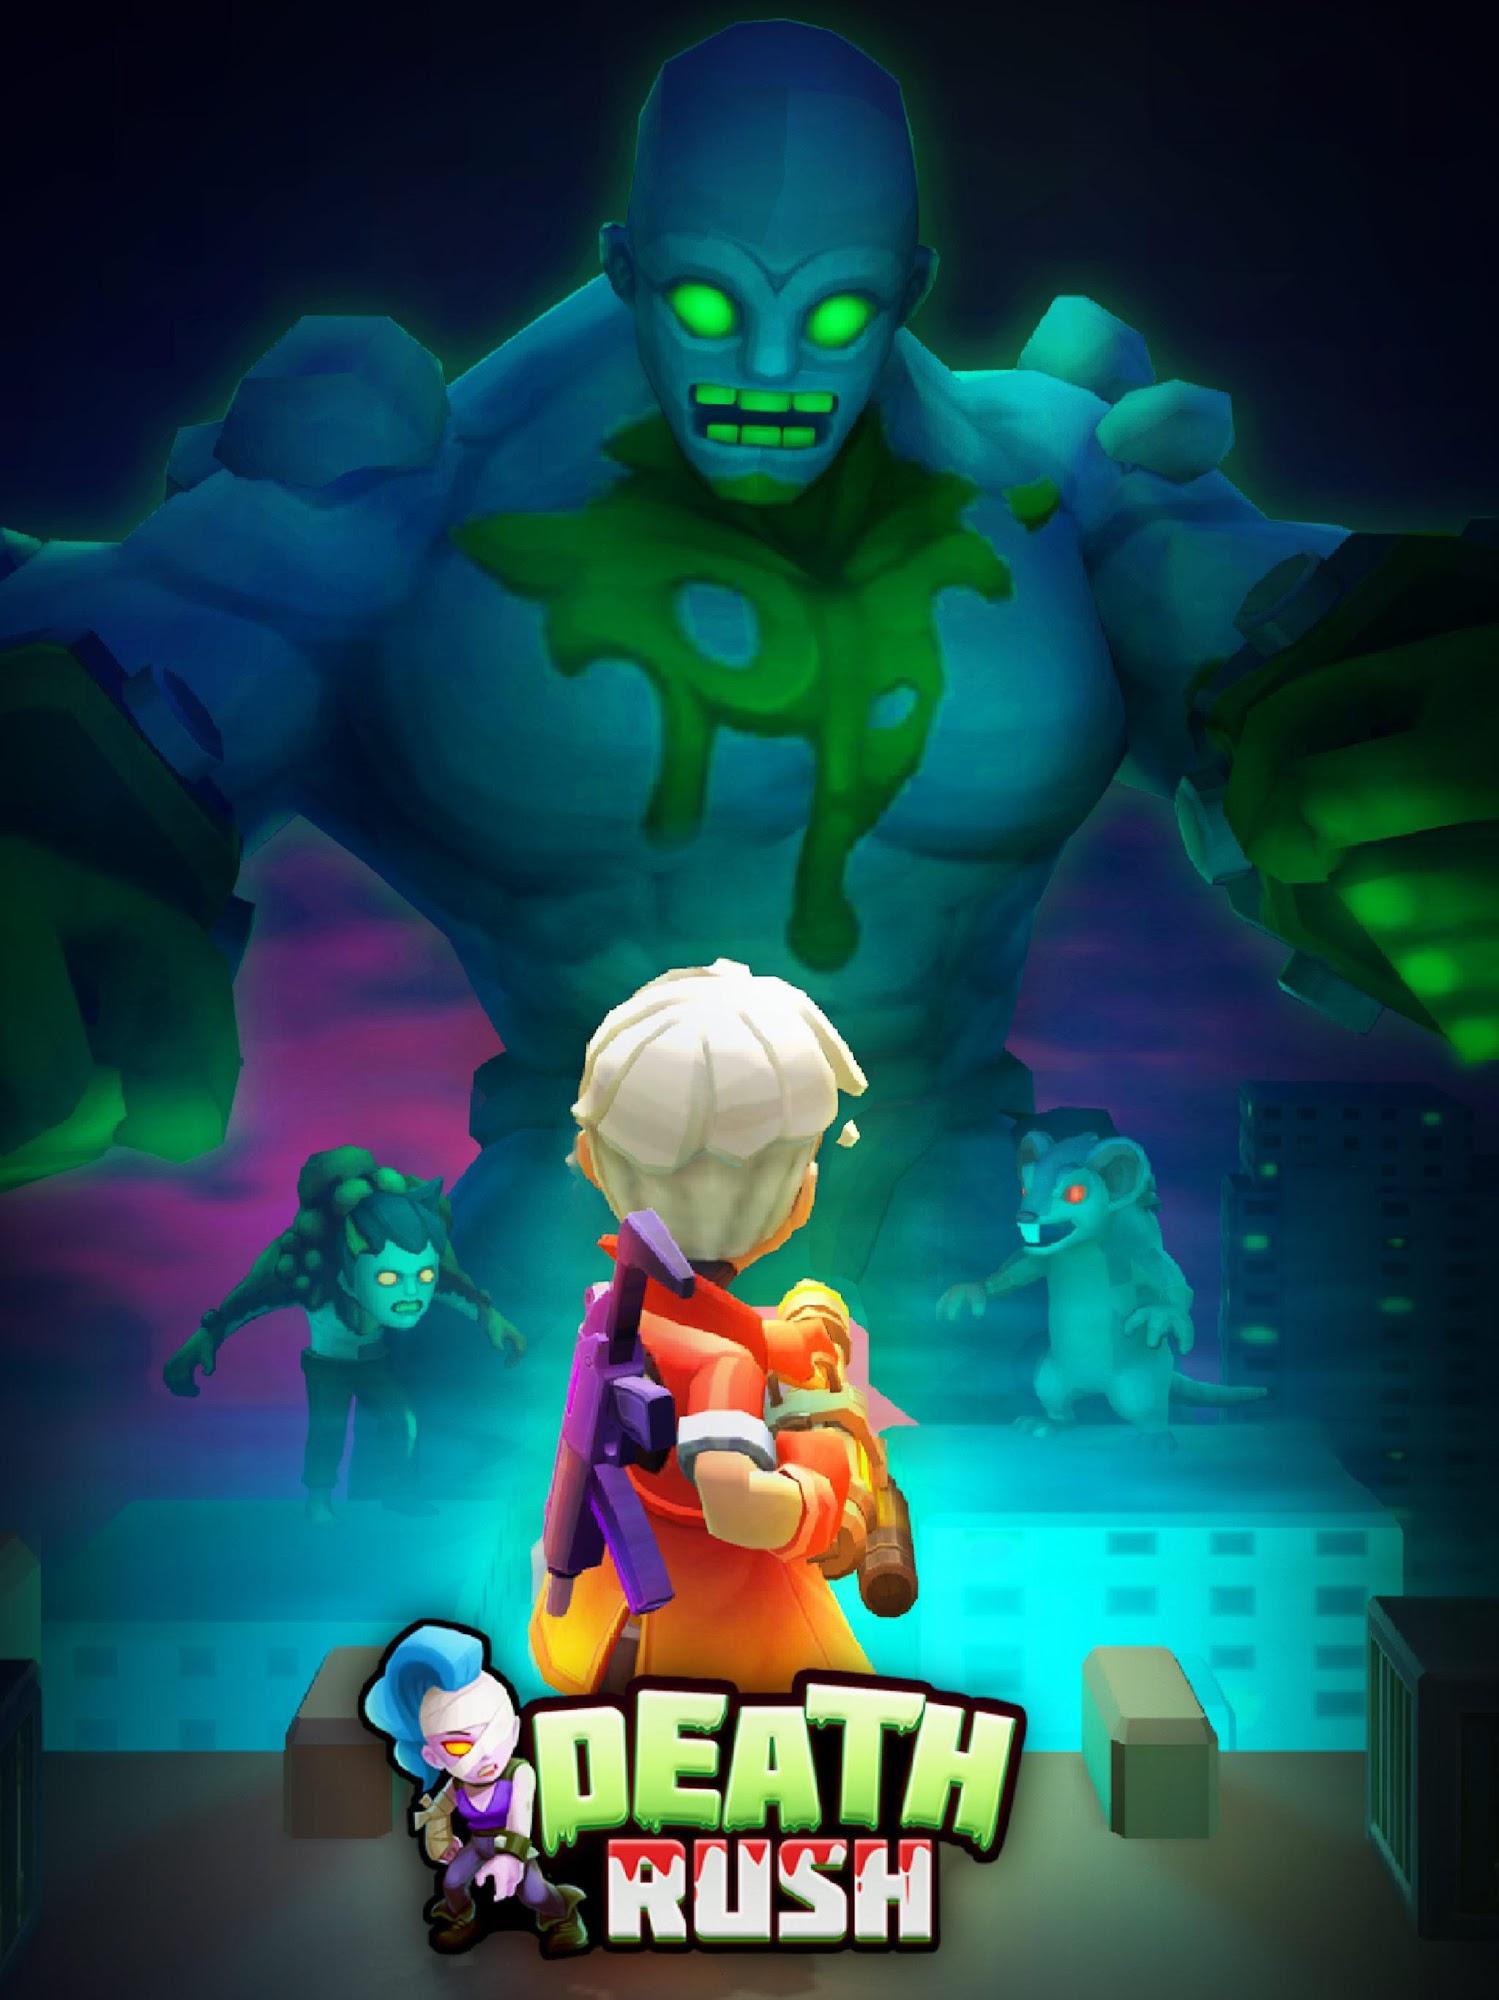 Death Rush screenshot 1